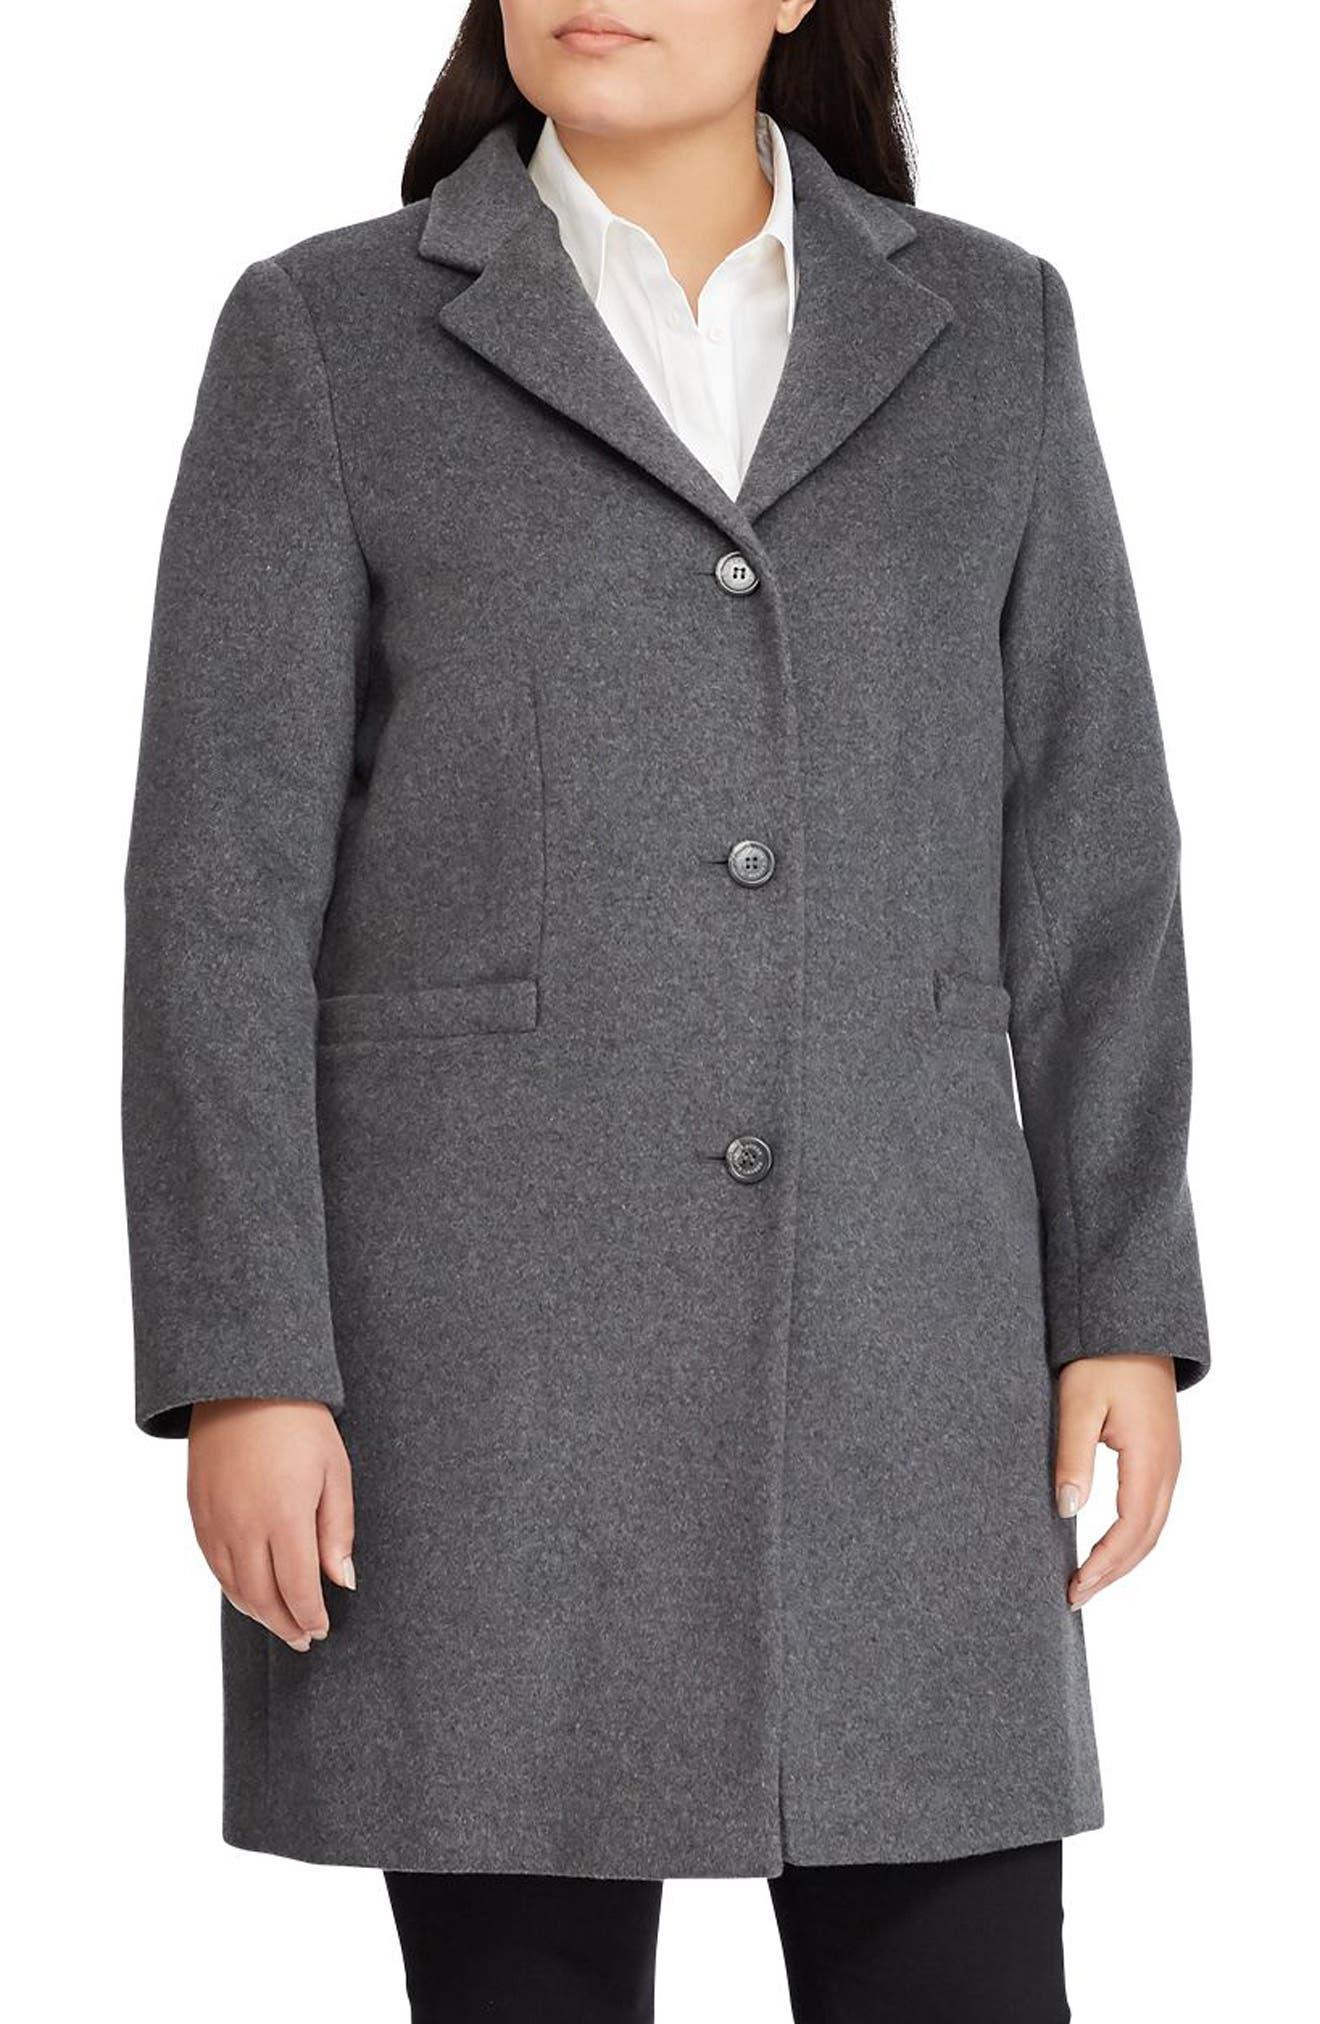 LAUREN RALPH LAUREN, Wool Blend Reefer Coat, Main thumbnail 1, color, 026